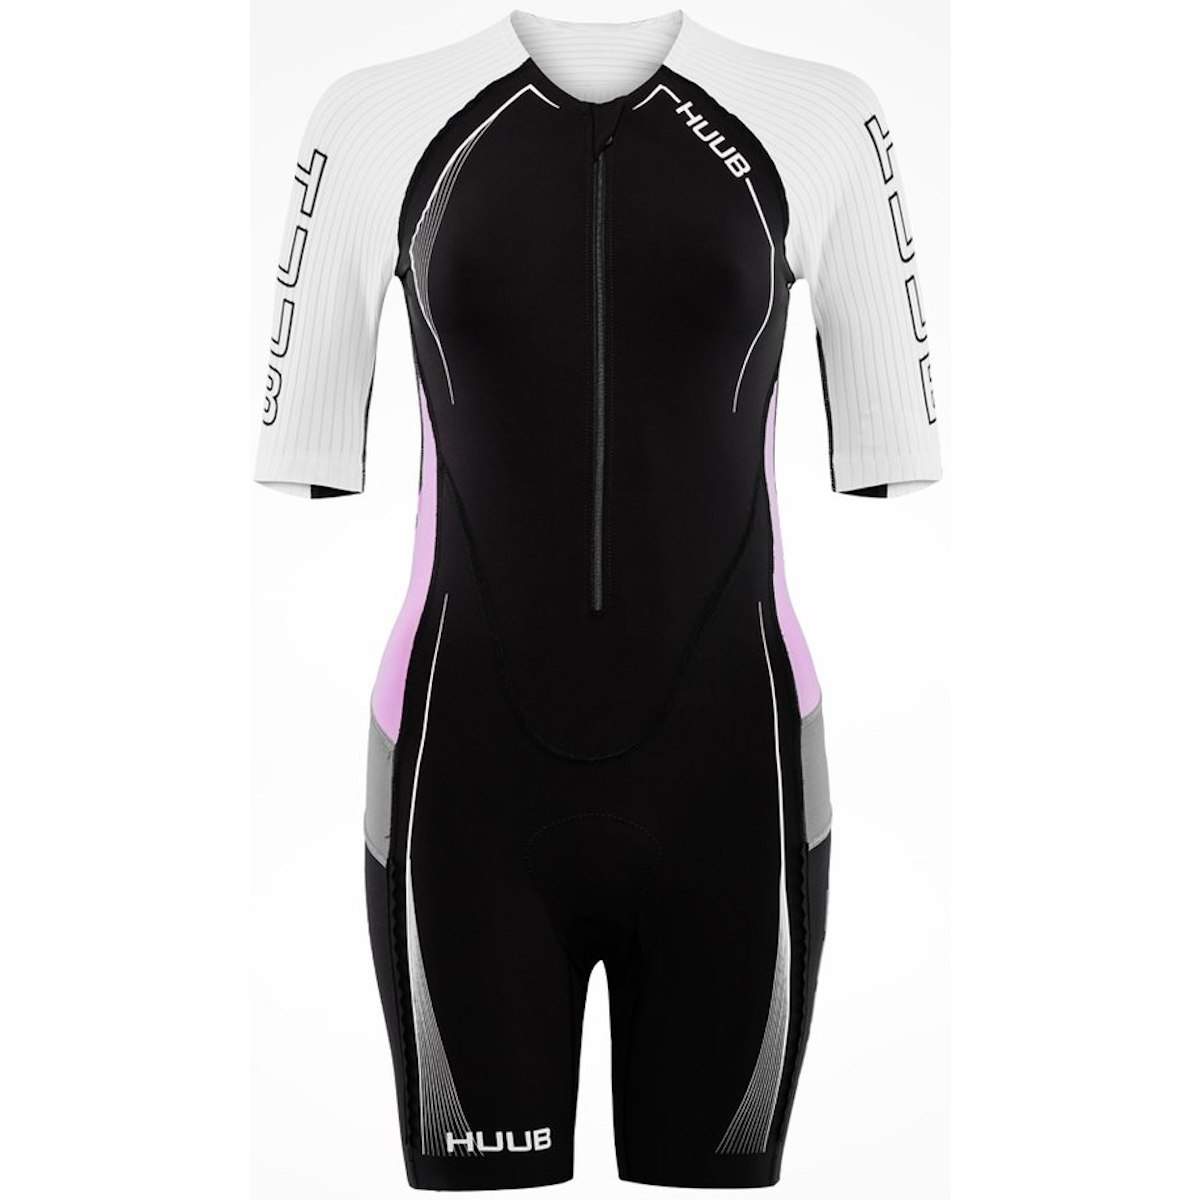 Produktbild von HUUB Design Anemoi Aero Damen Trisuit - schwarz/lila